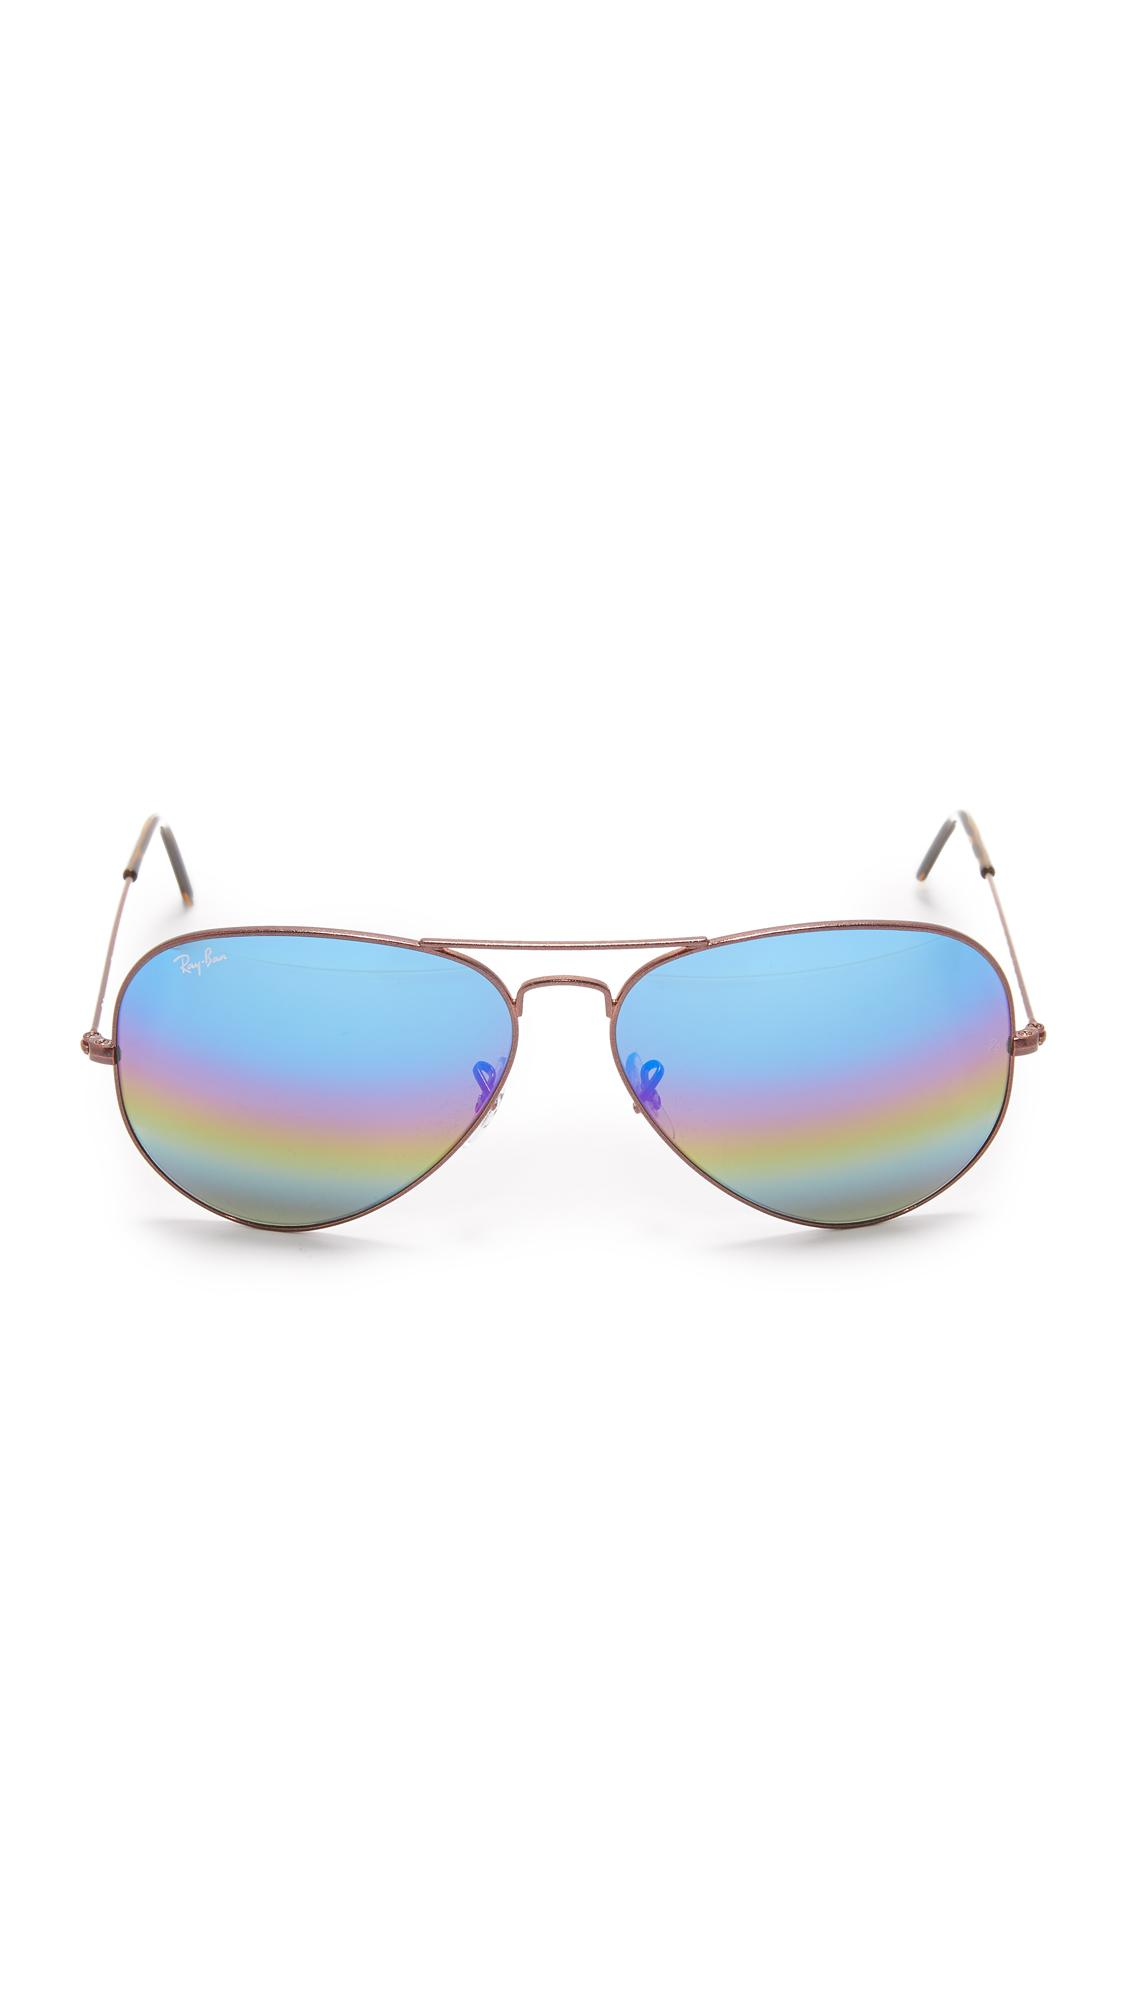 e8ecb5d118 ... get ray ban blue rainbow mirrored aviator sunglasses lyst. view  fullscreen d2aed 7c802